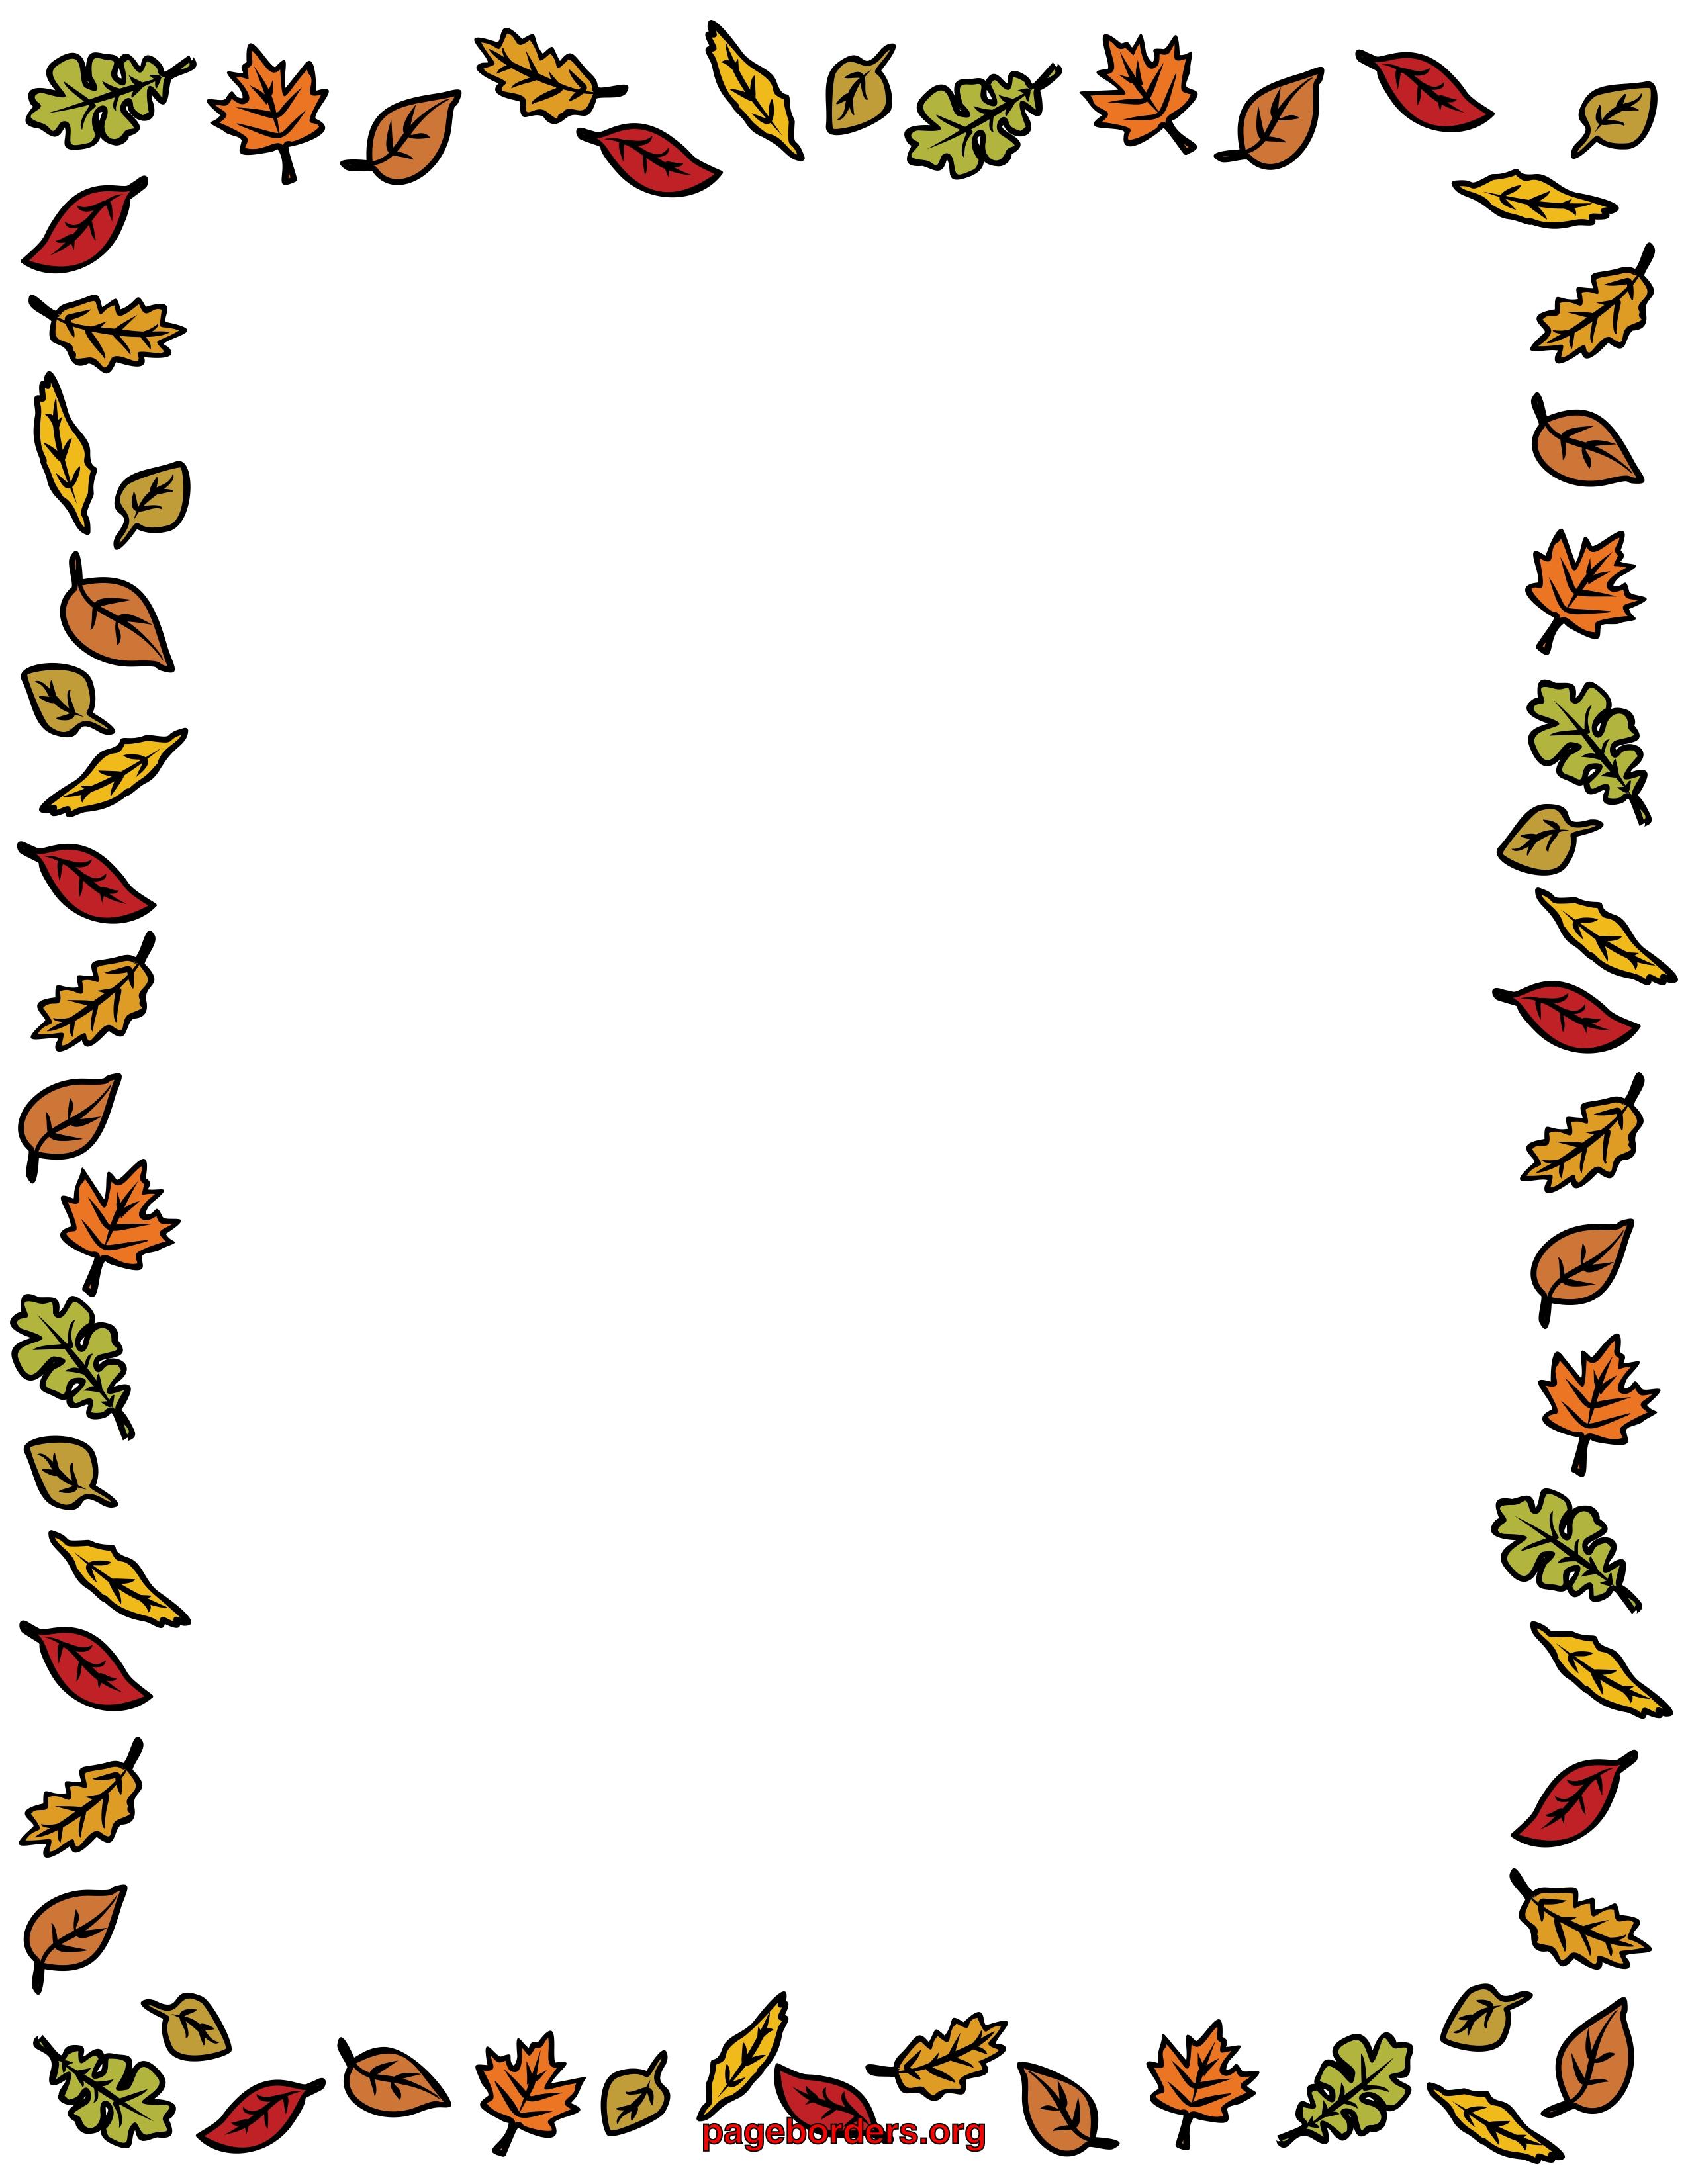 2550x3300 Fall Pumpkin Border Clipart